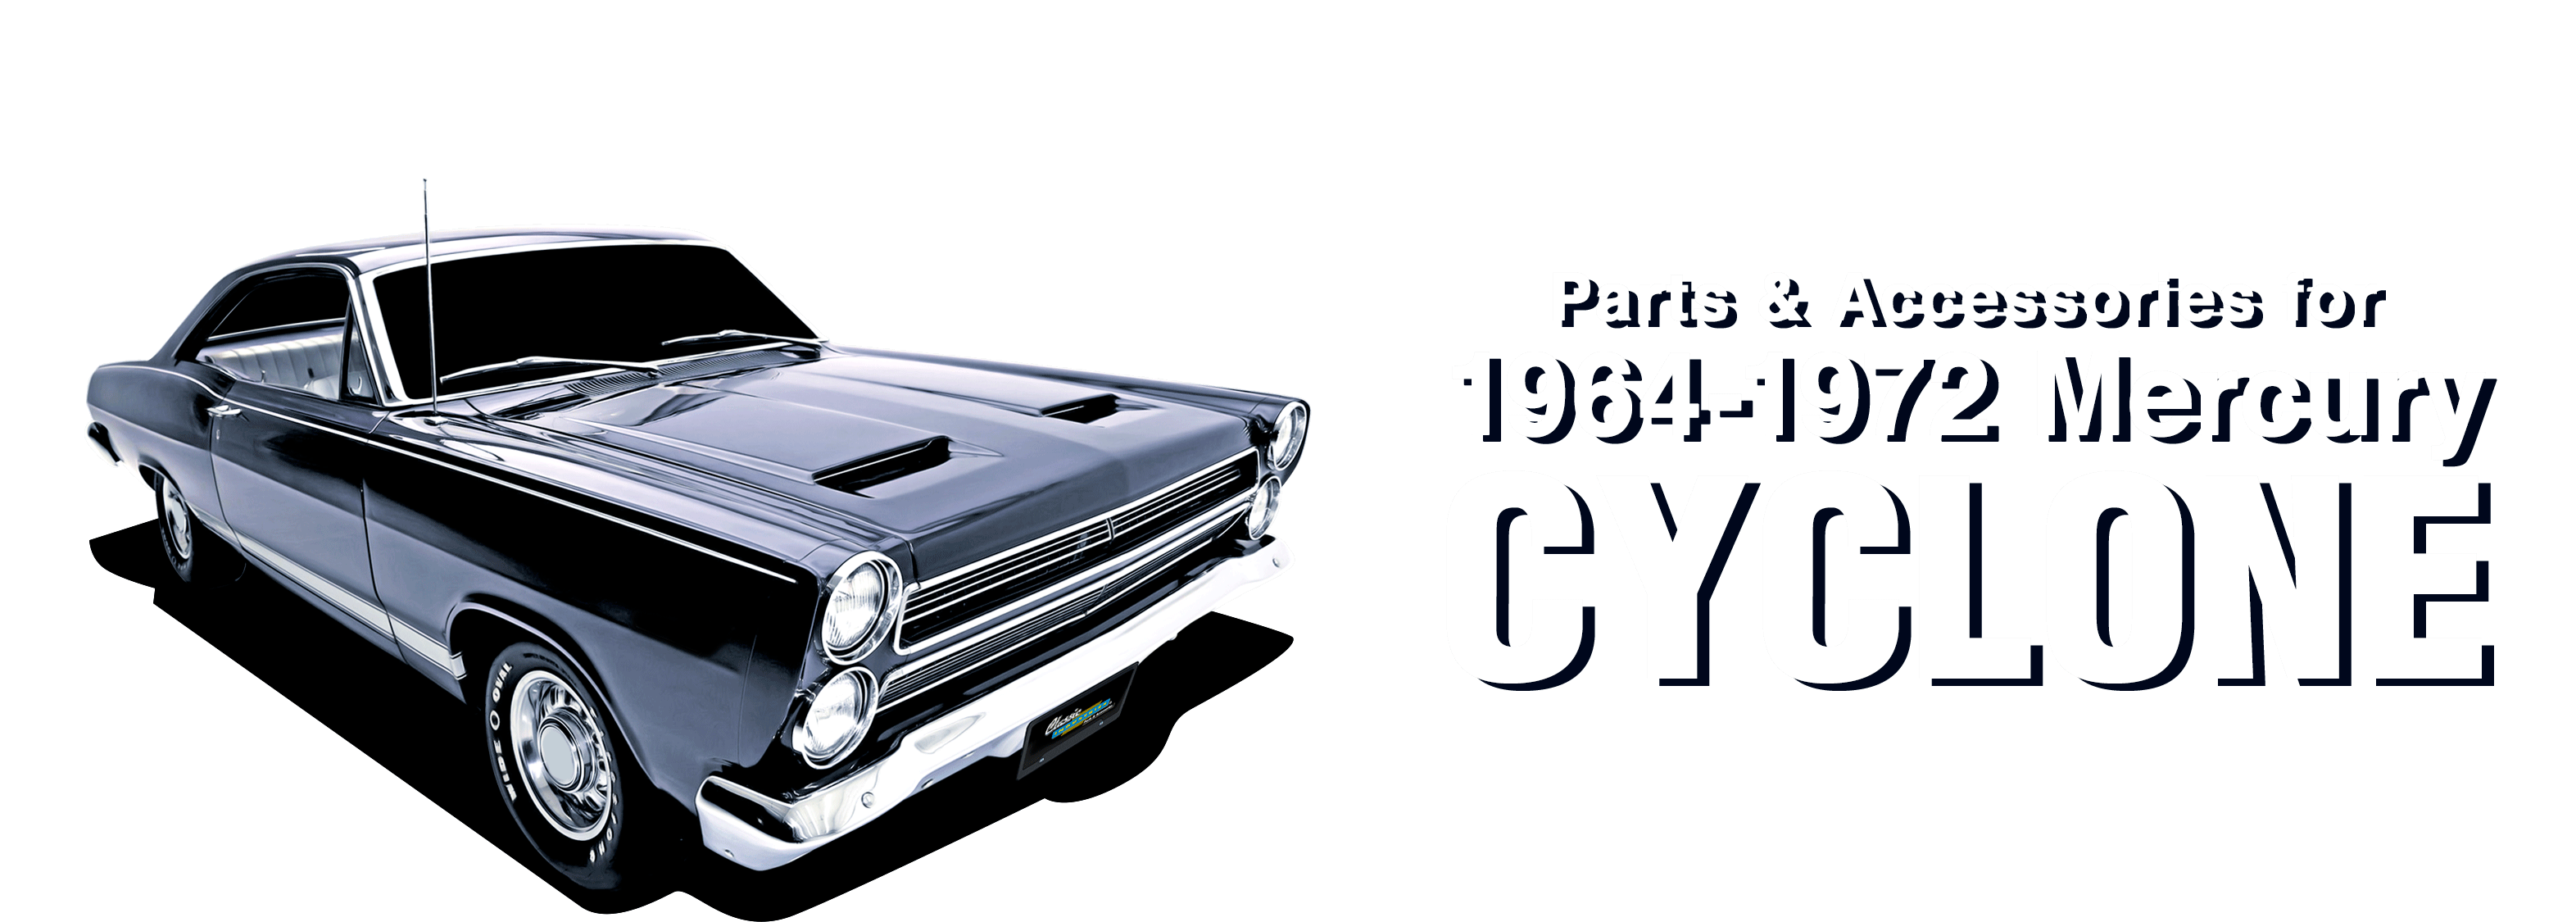 Mercury-Cyclone-vehicle-desktop_v2